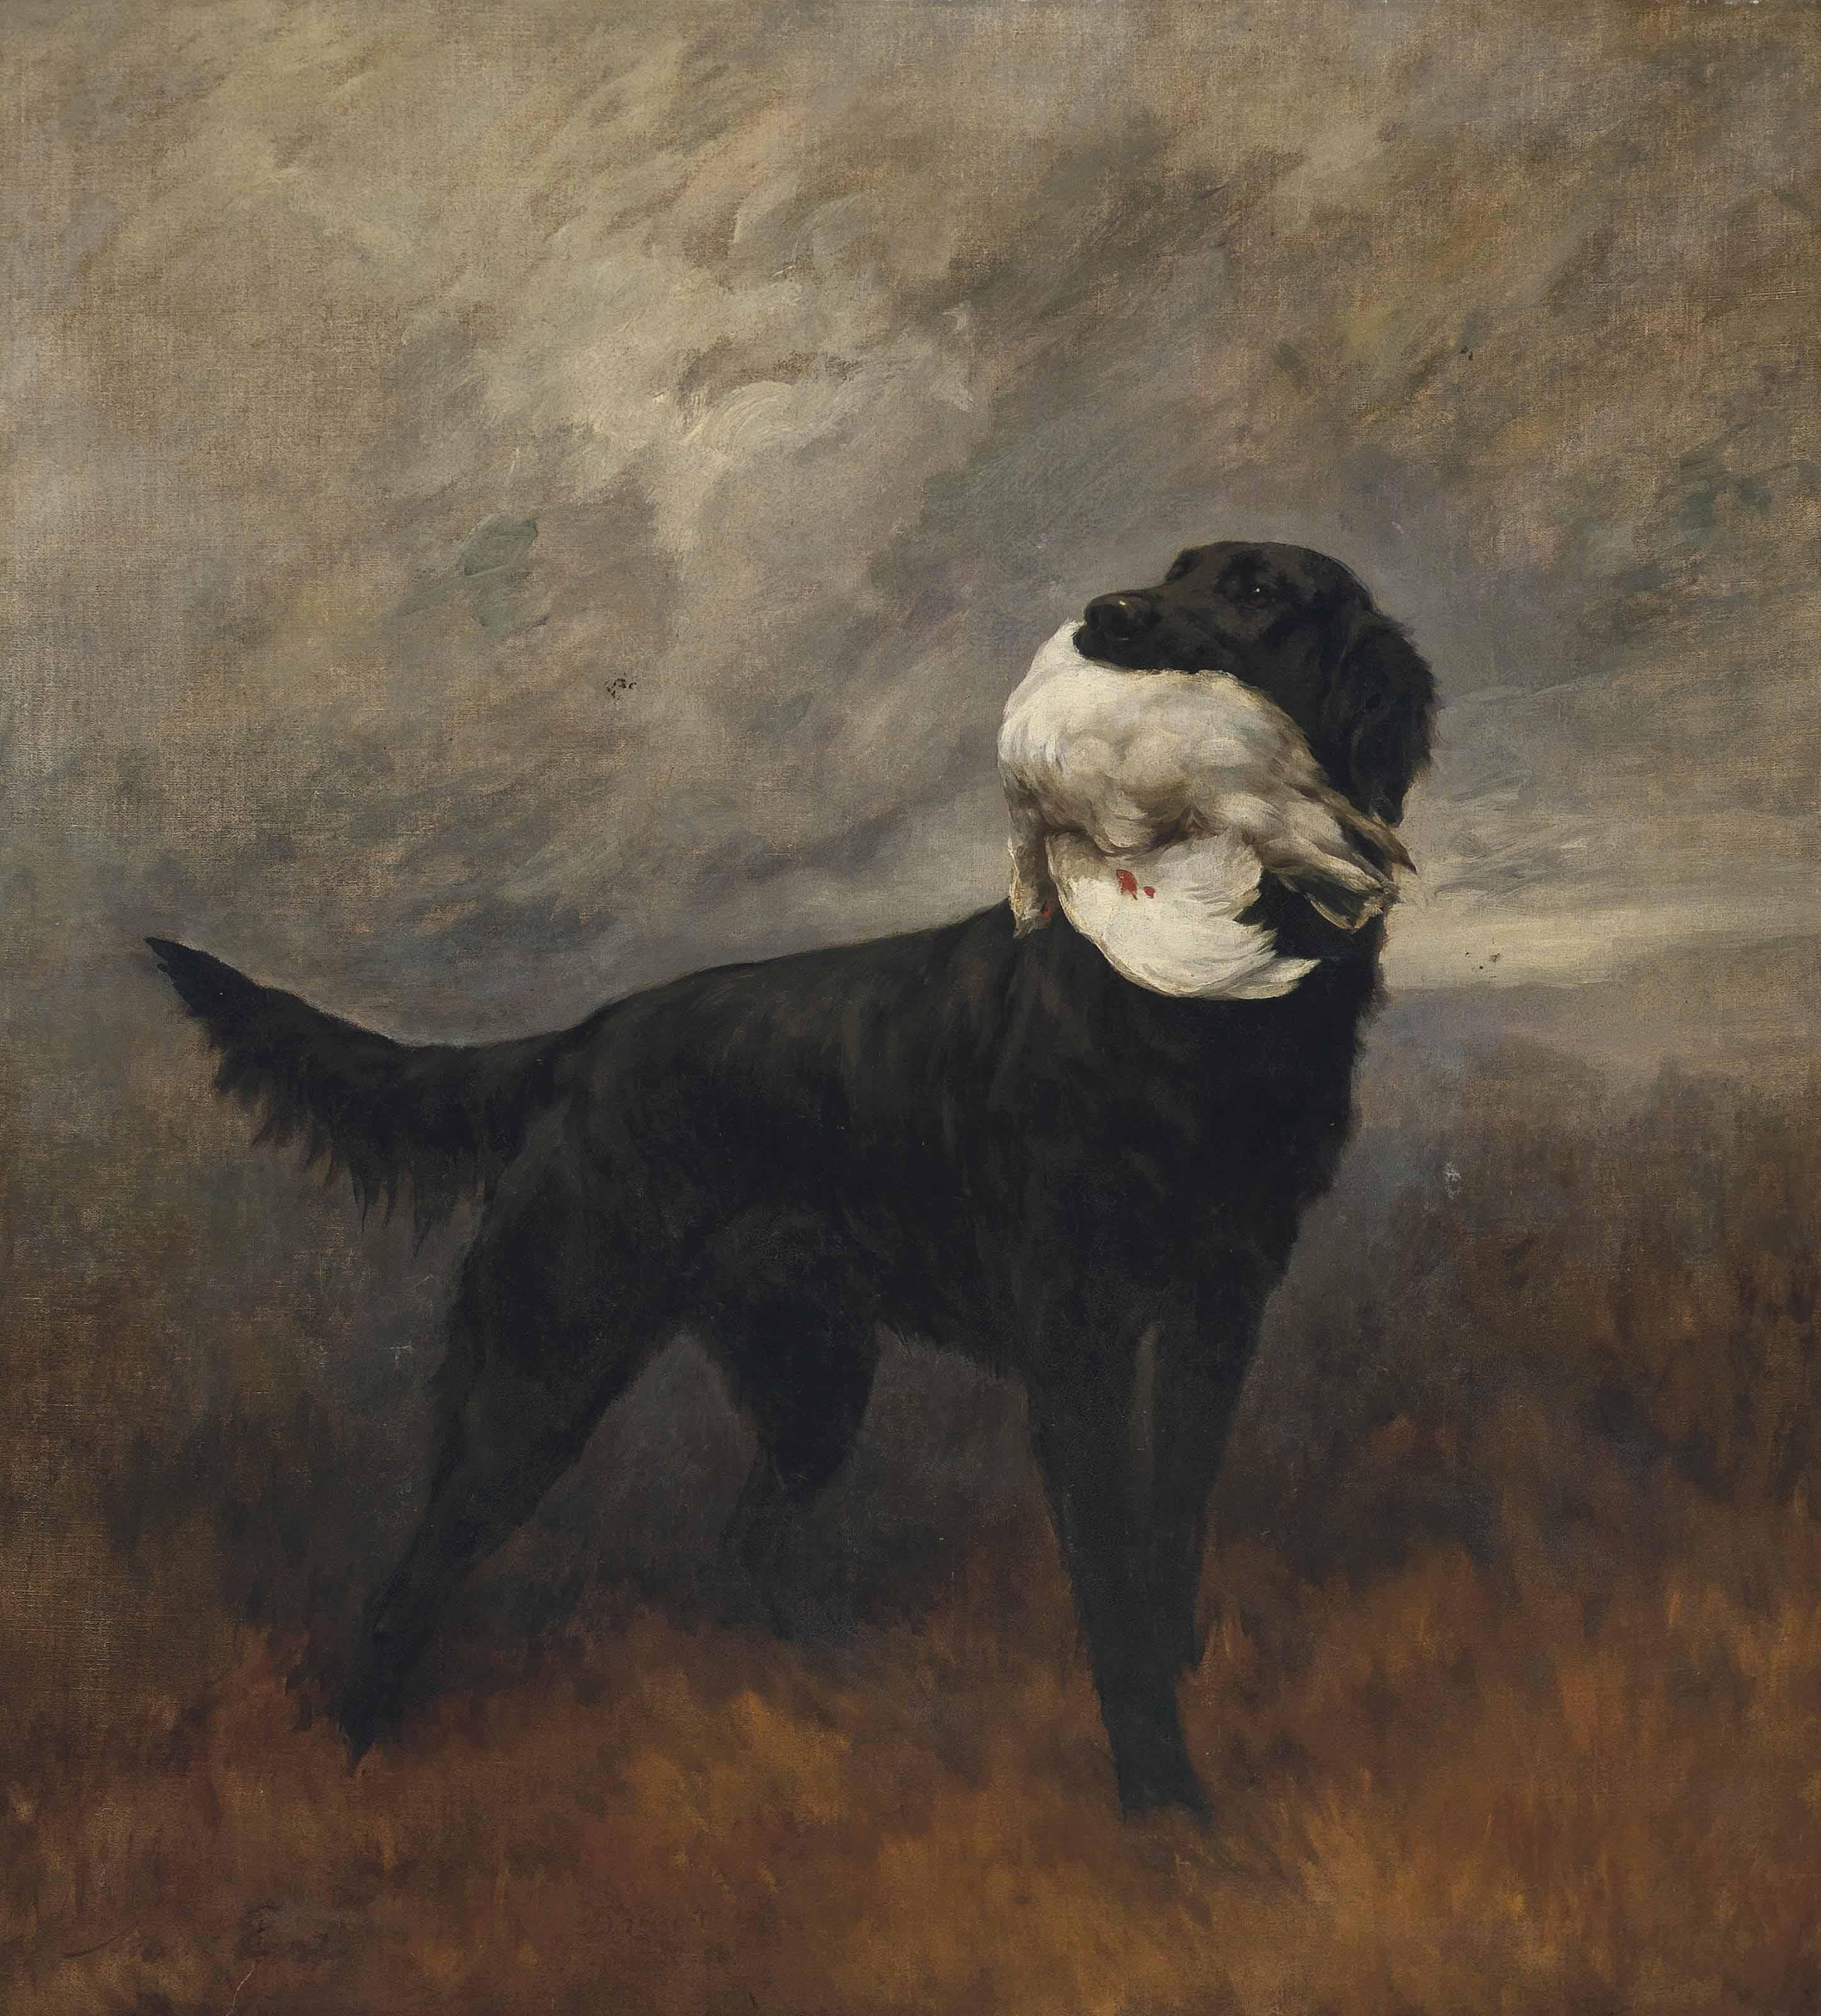 A black retriever in an extensive mountainous landscape